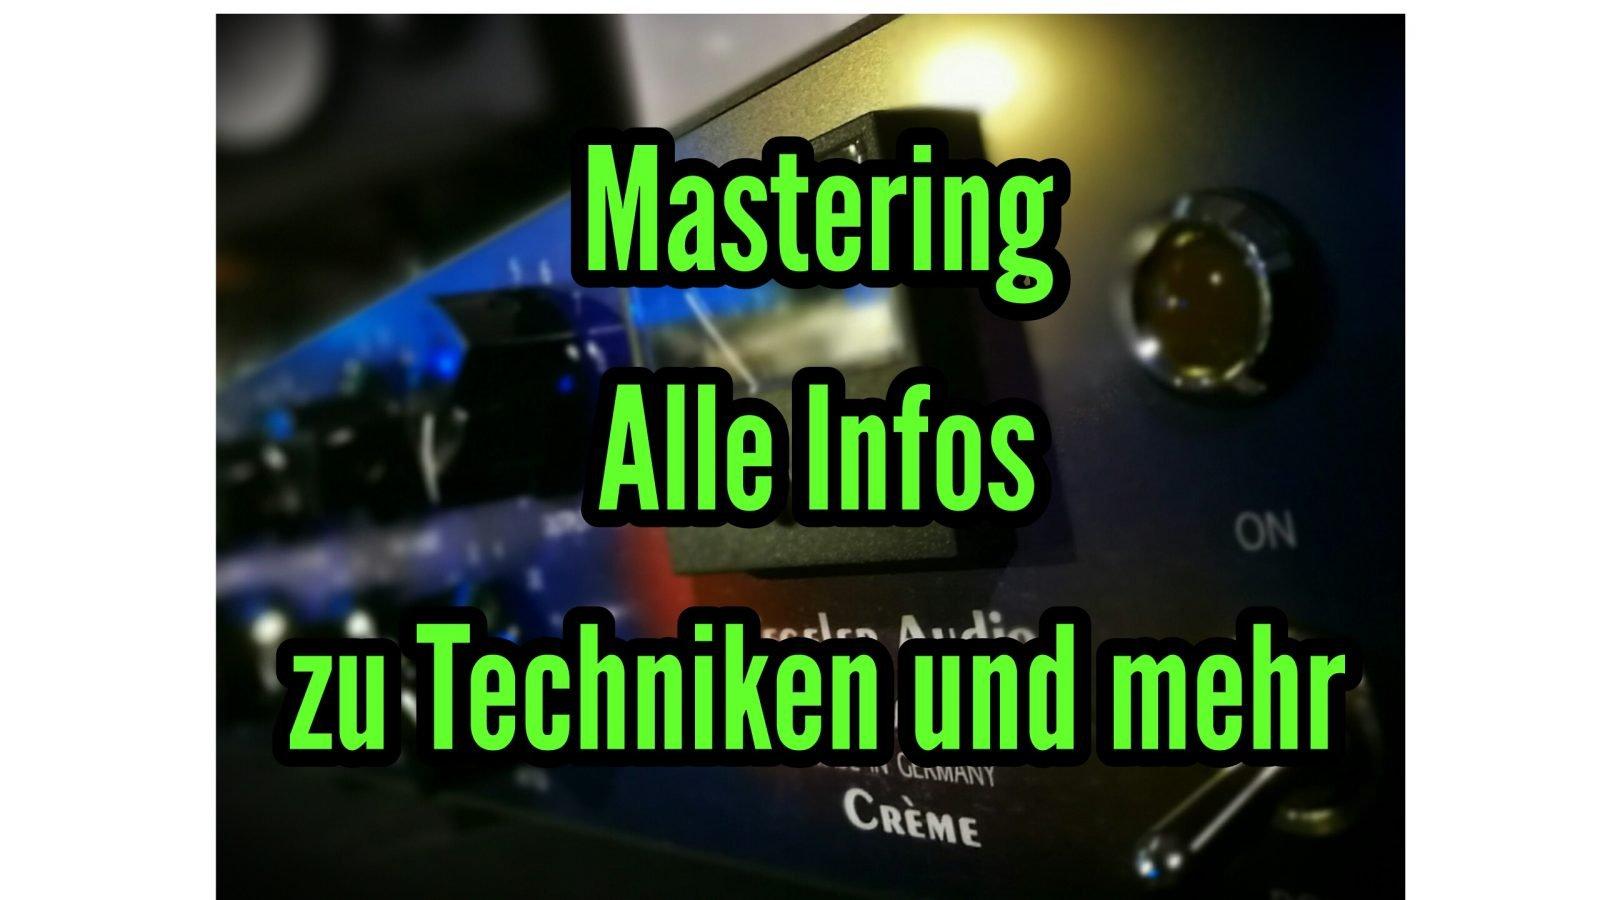 Online Mastering, Audio Mastering Hamburg, myaudio.pro |Online Mastering|Raumakustik Optimierung, myaudio.pro |Online Mastering|Raumakustik Optimierung